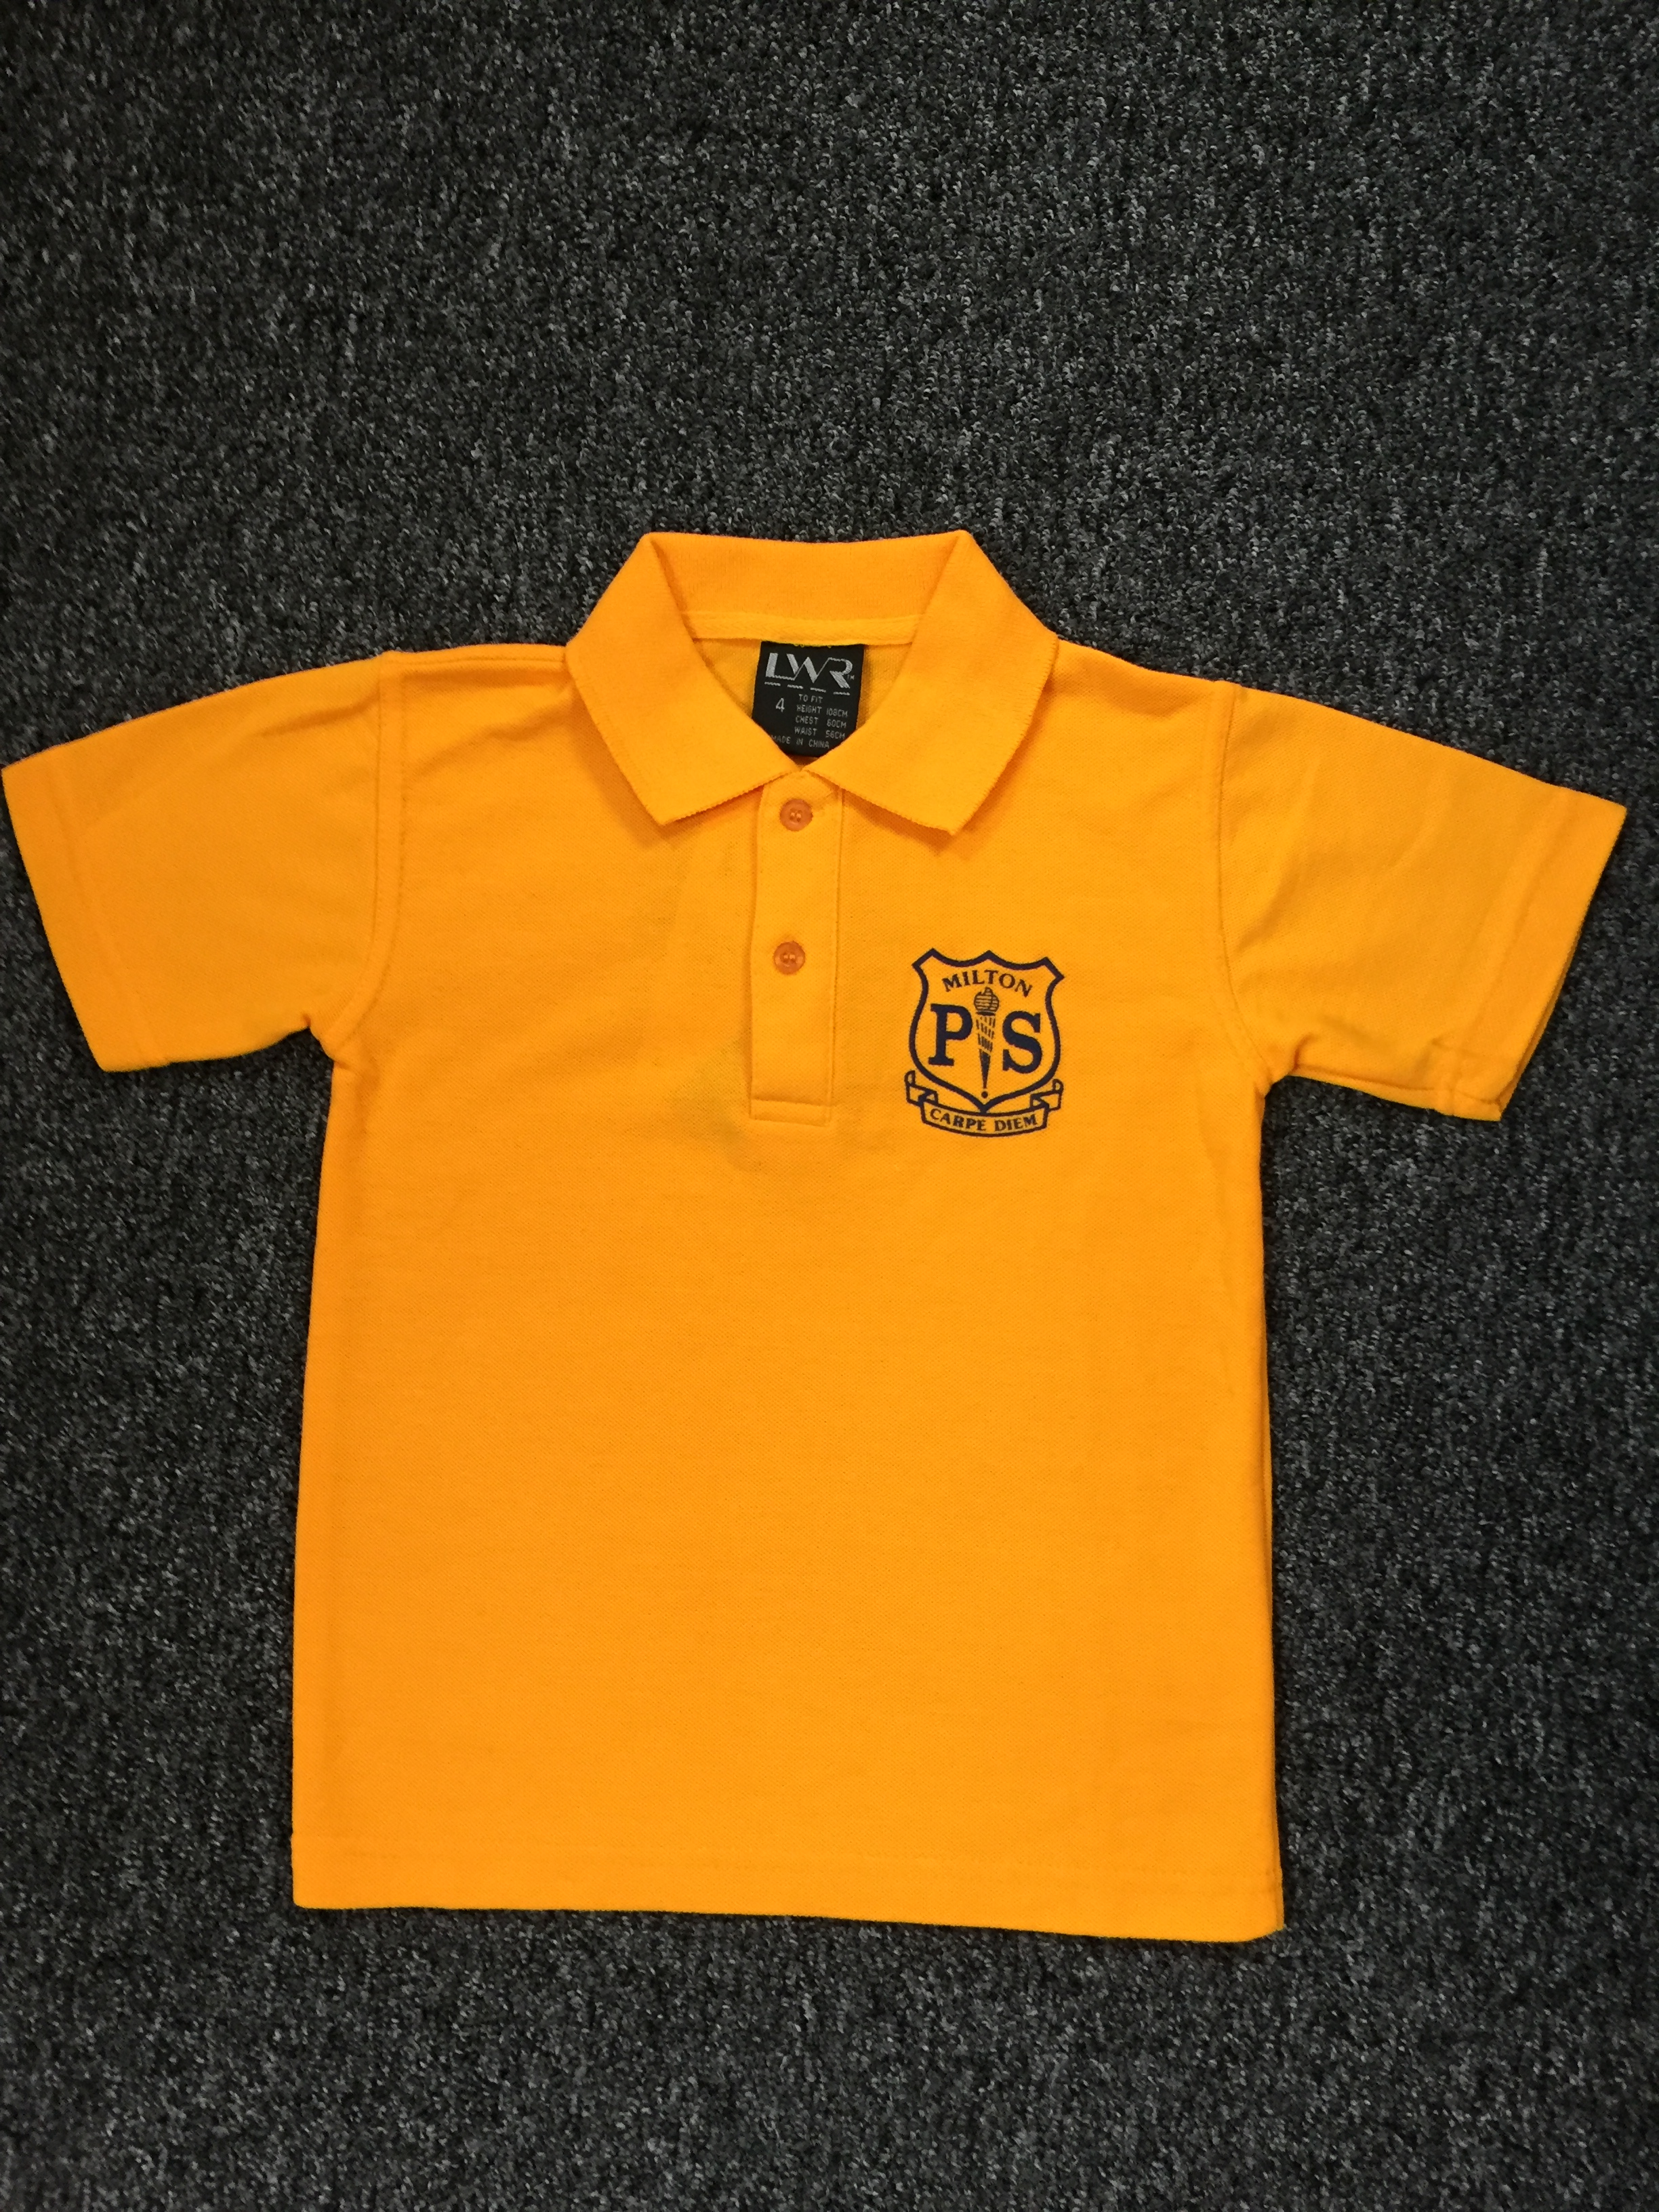 LWR gold unisex  polo shirt